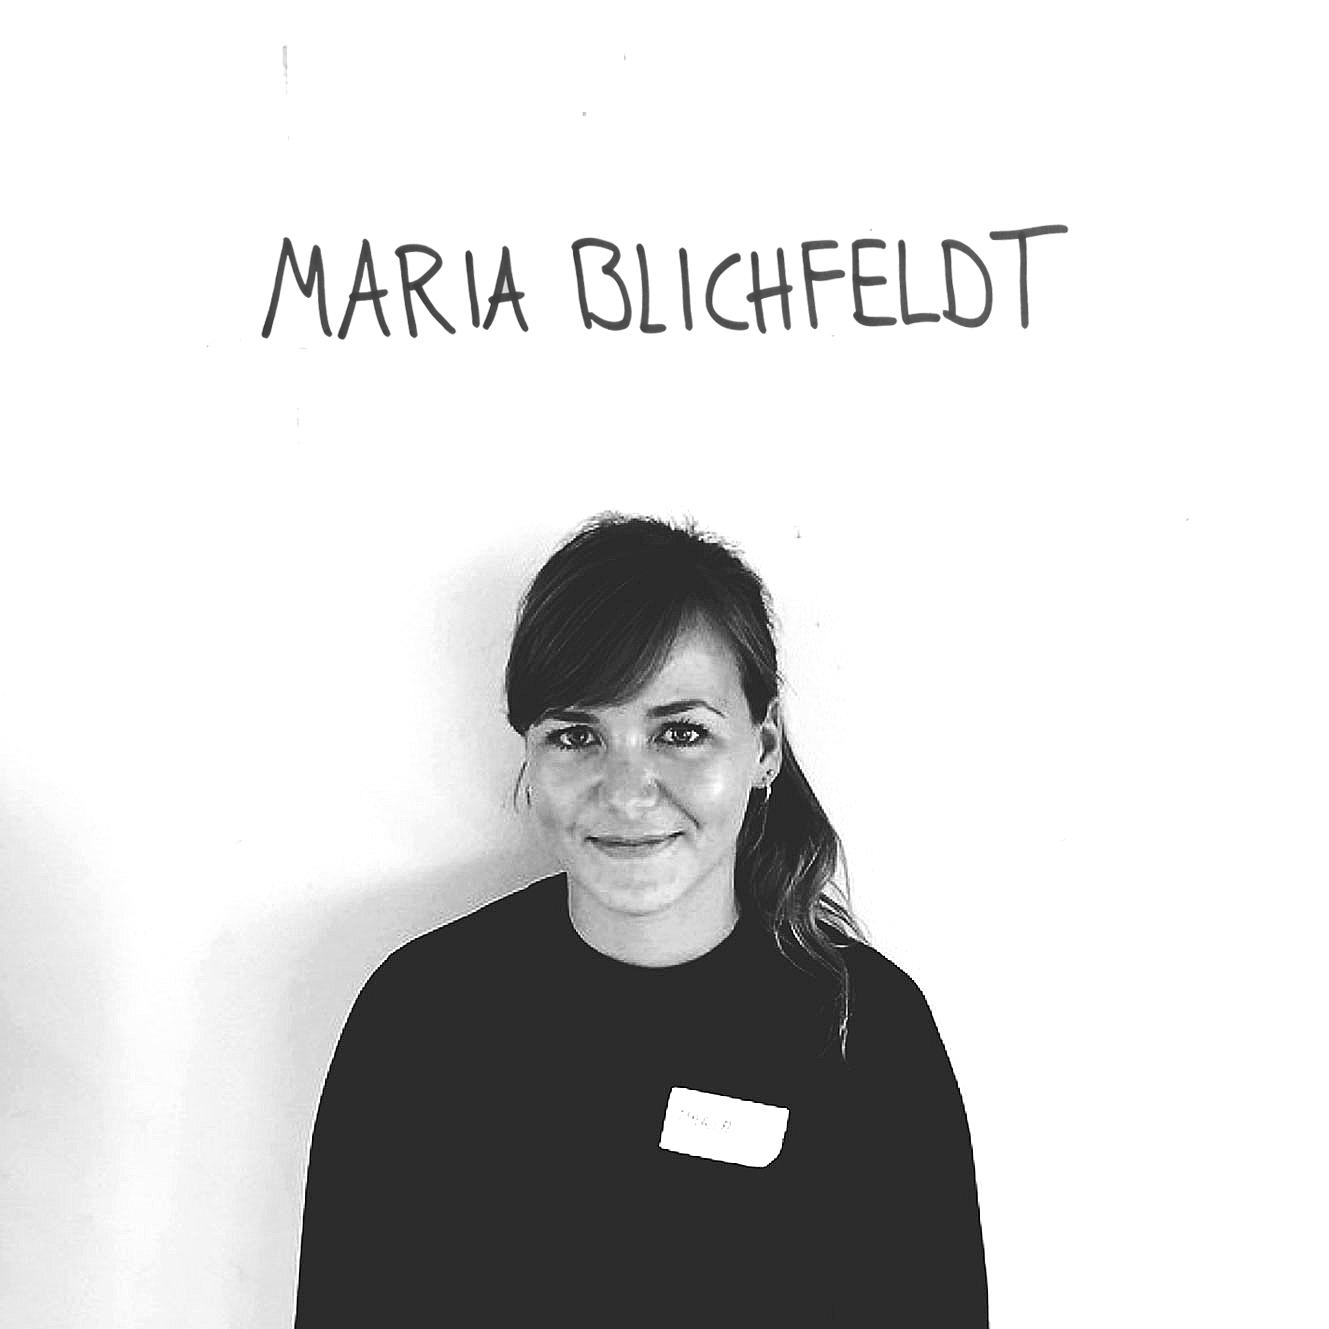 MARIA BLICHFELDT